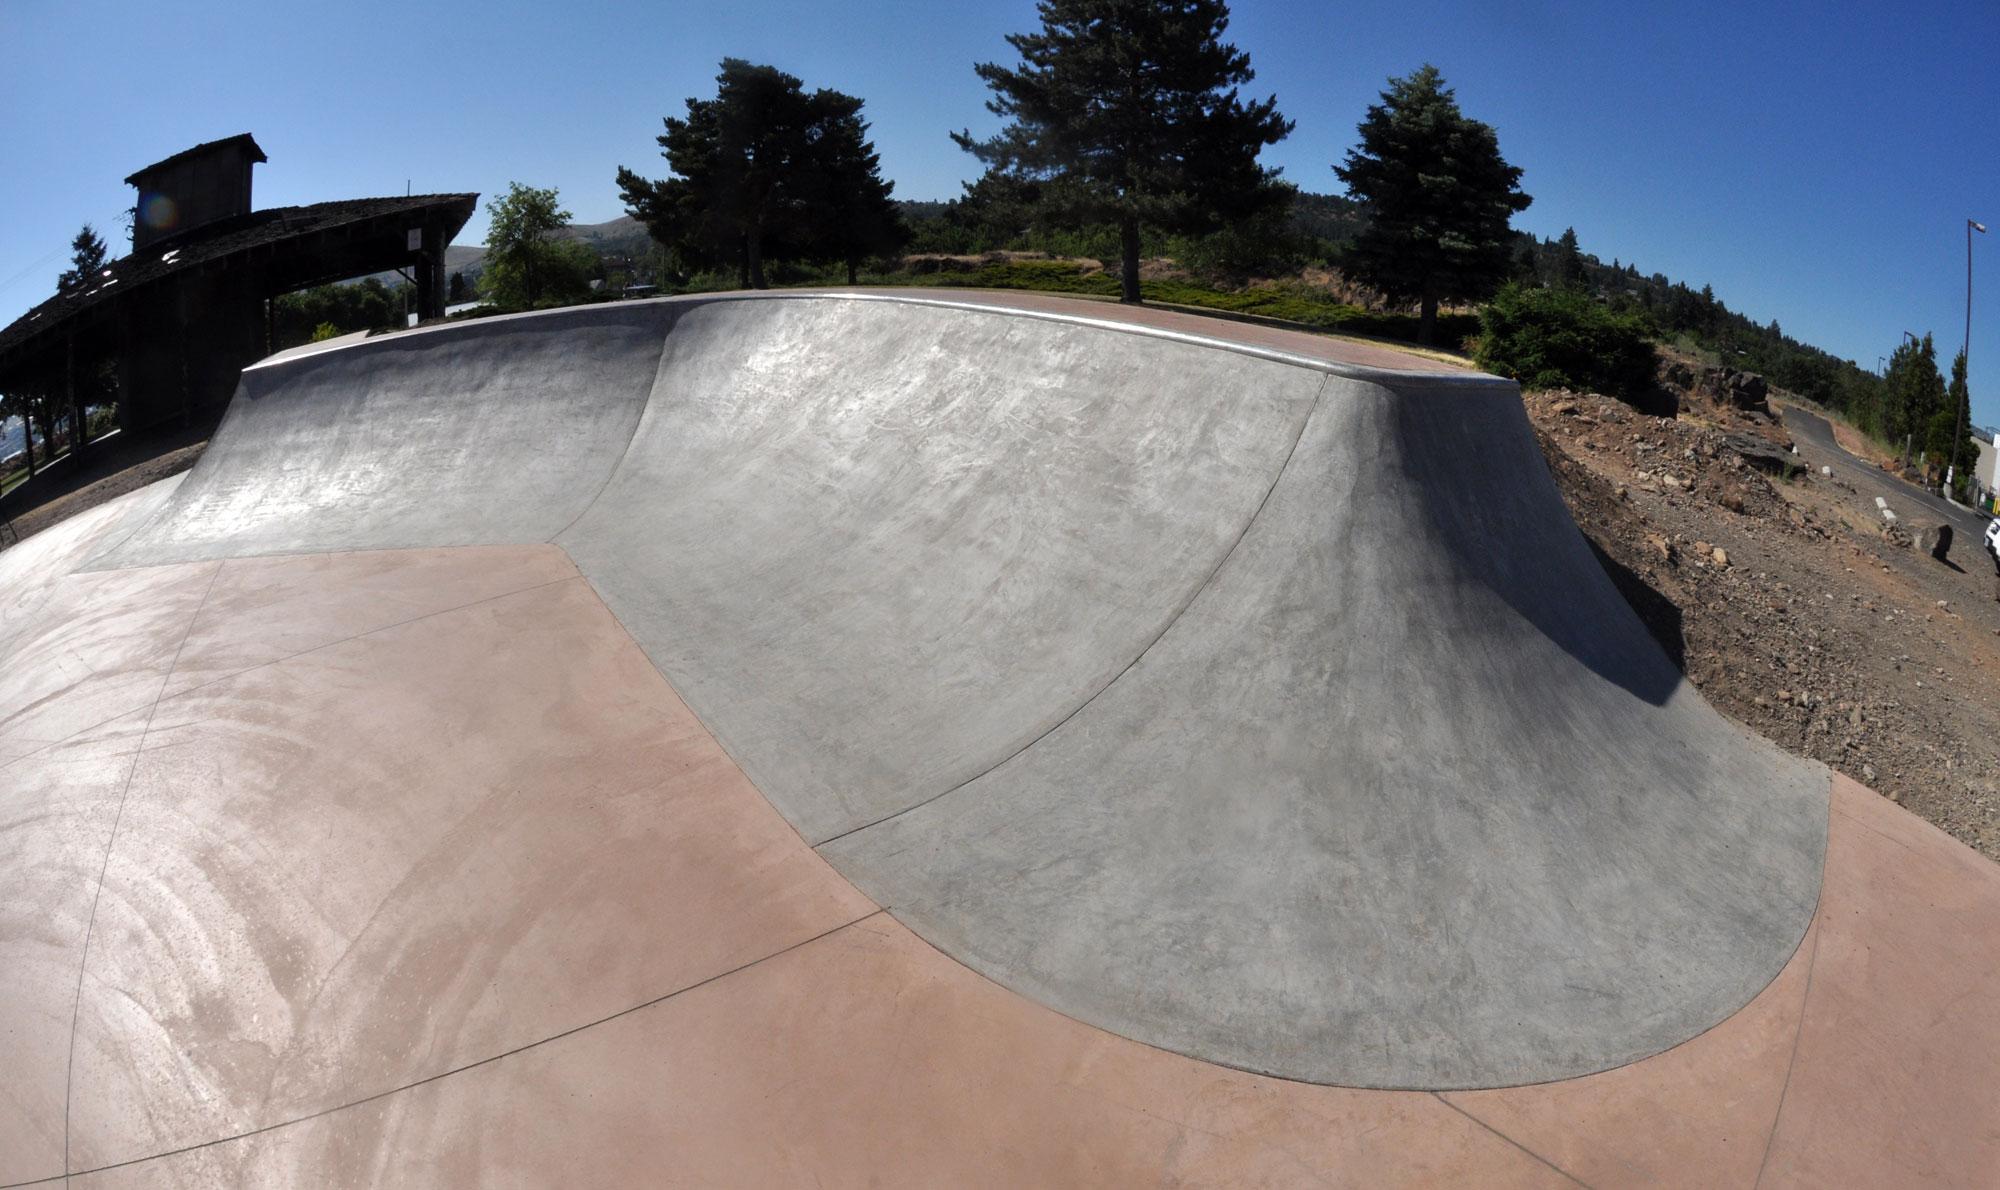 thompson park skatepark, the dalles, oregon